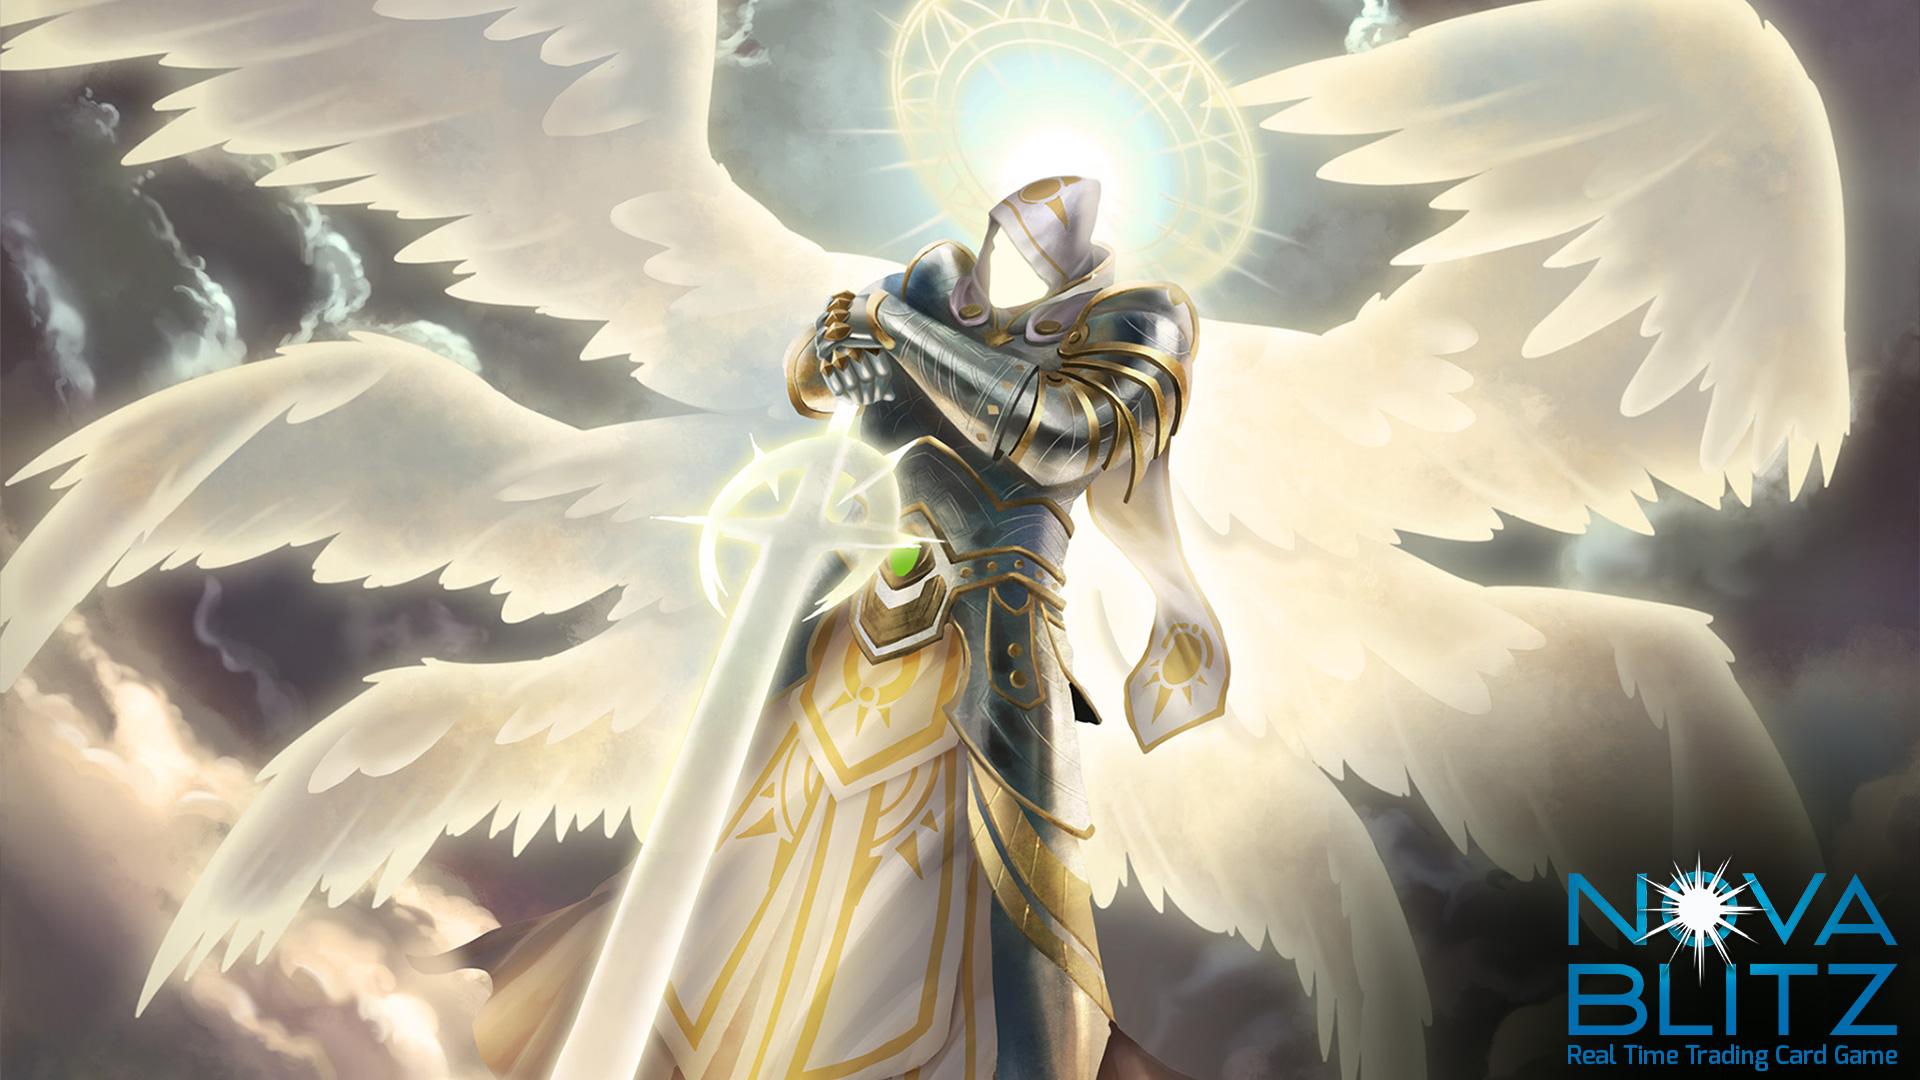 Lord-of-Heaven-1920x1080.jpg